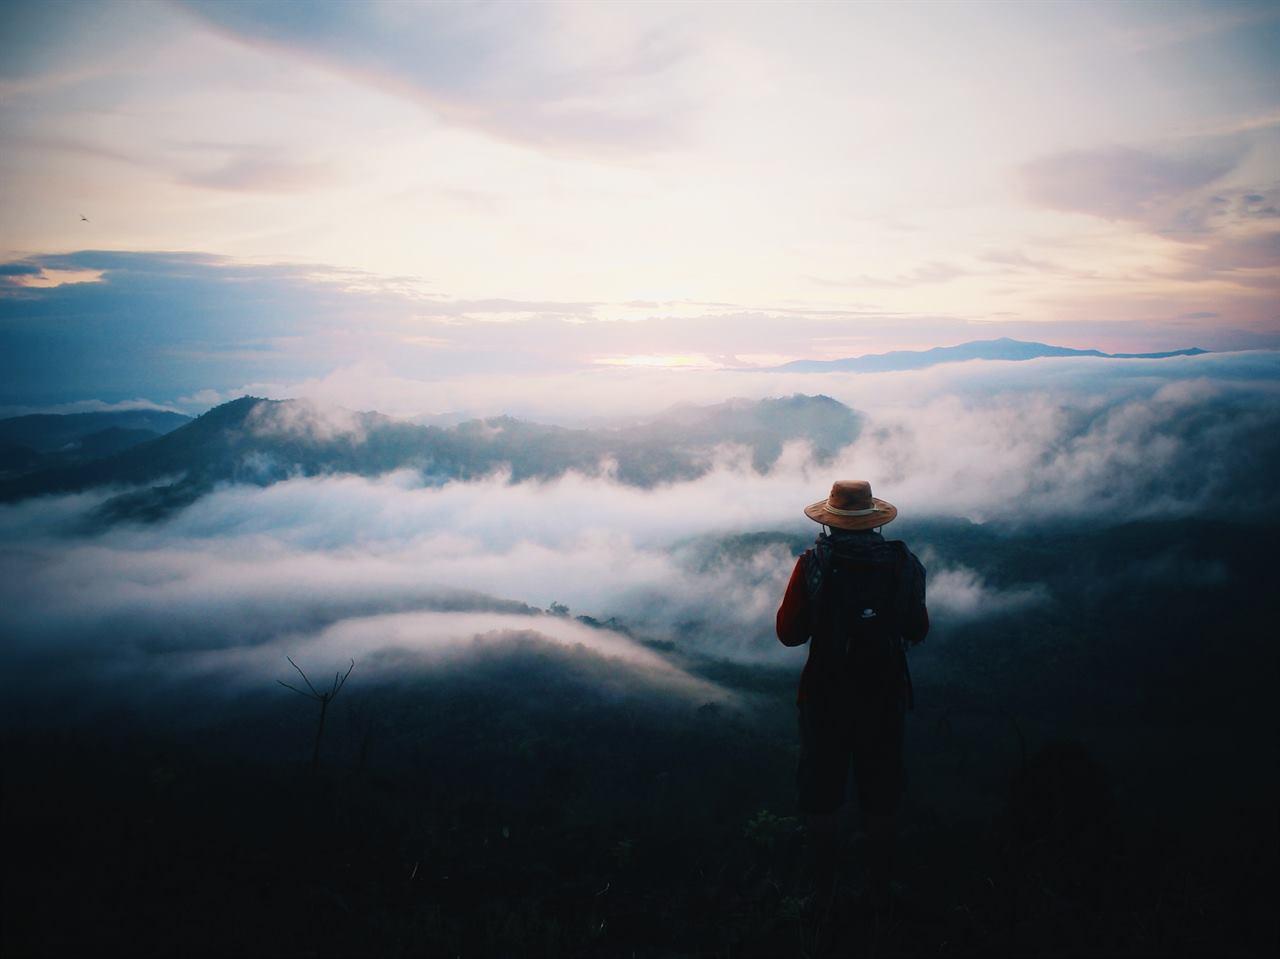 Путешественник в горах в тумане